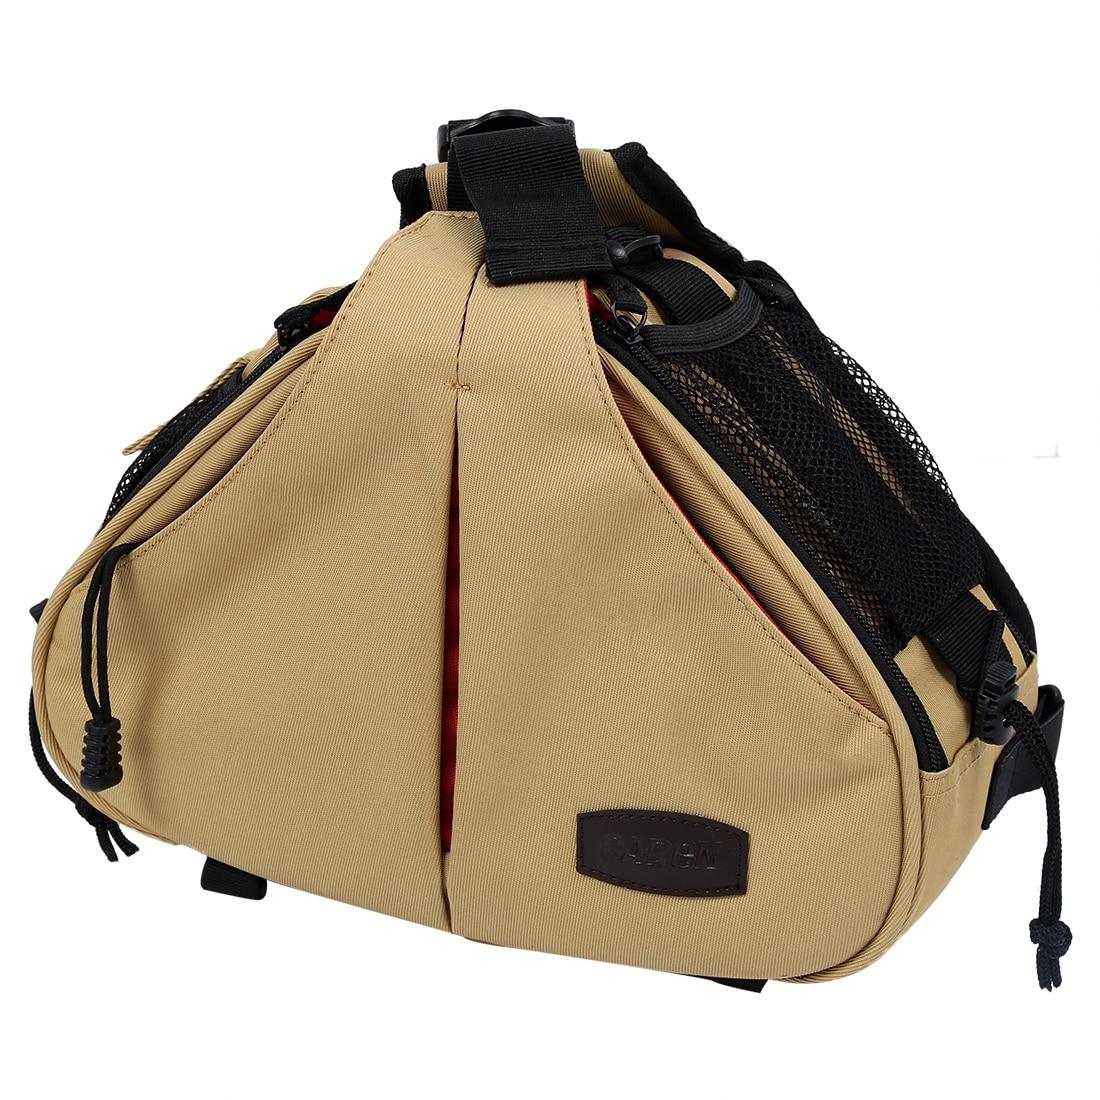 MAHA Caden K1 Waterproof Fashion Casual DSLR Camera Bag Case Messenger Shoulder Bag for Canon Nikon Sony (Khaki/Black) цена 2017